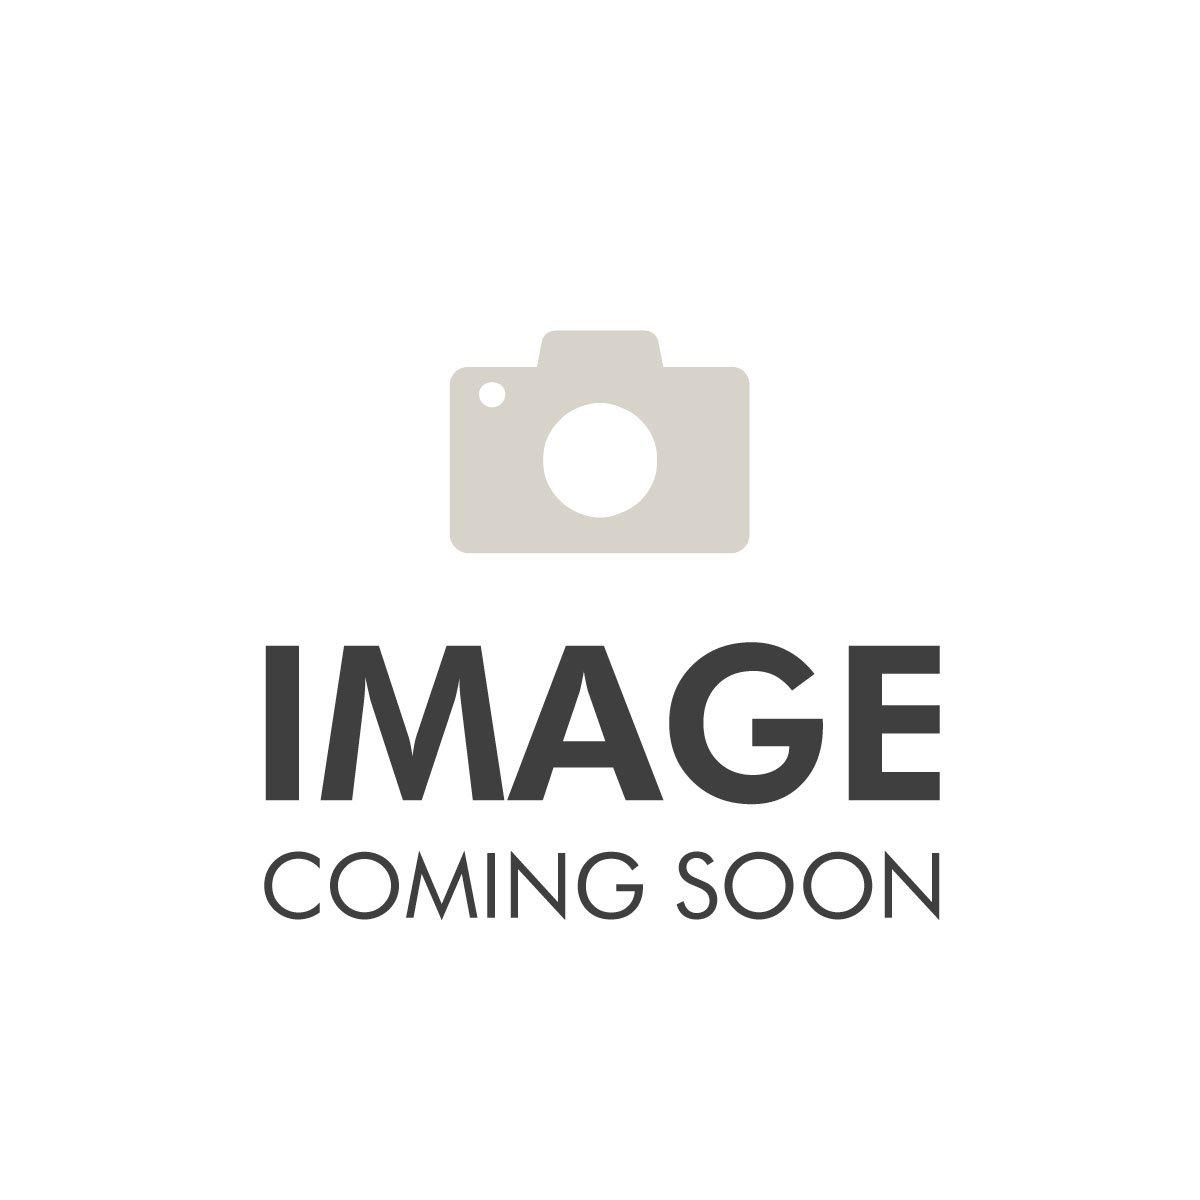 Uhlmann - Bavette retrofit - Inox